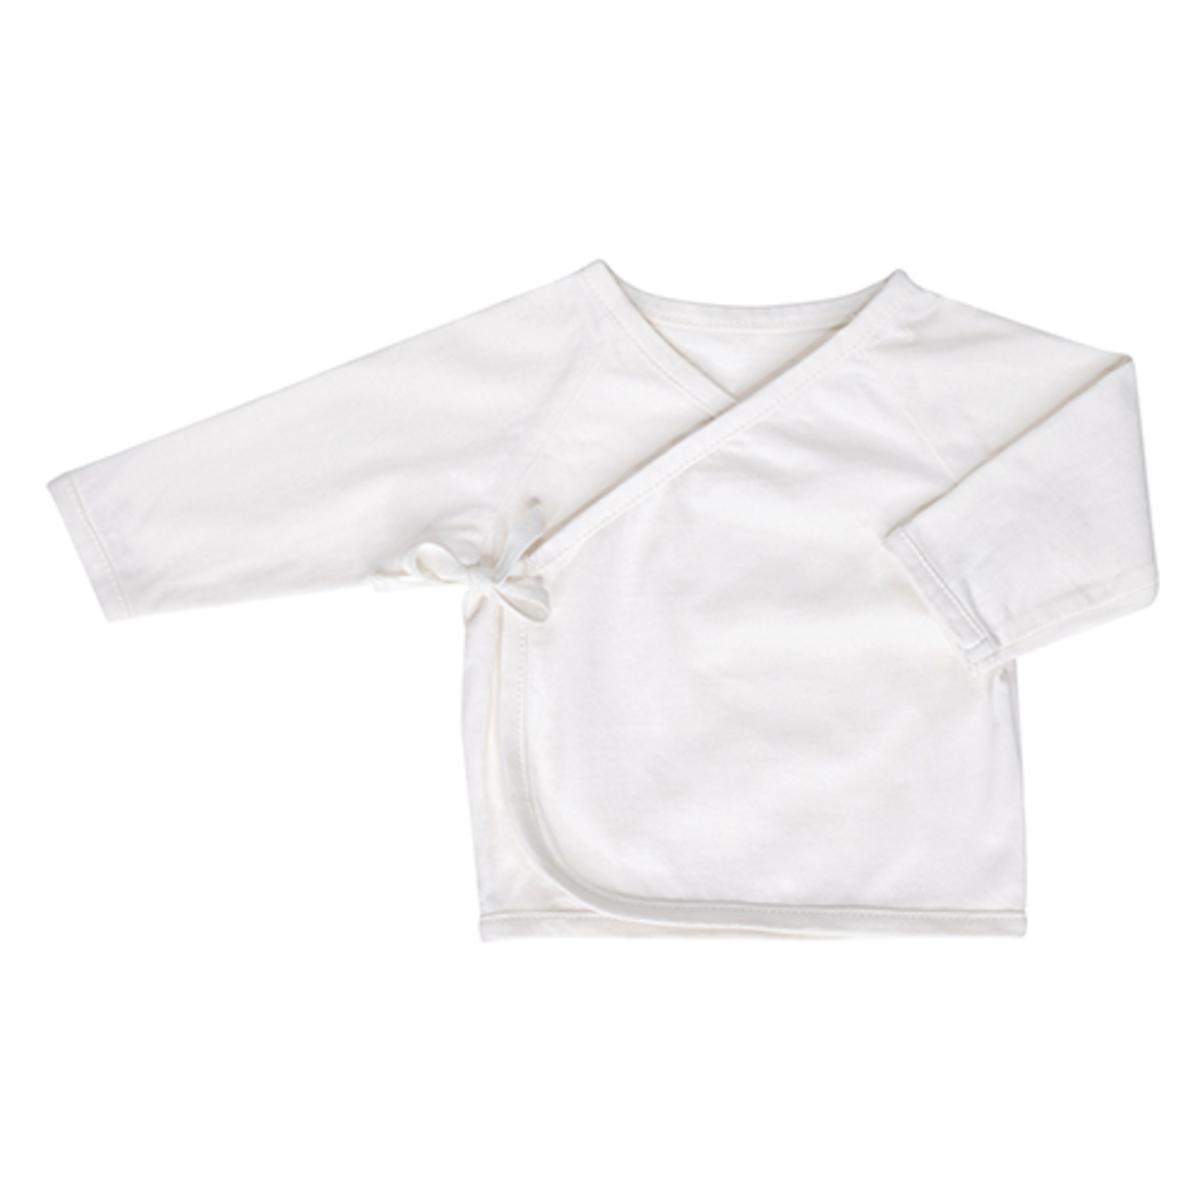 Haut bébé Cardigan Kimono Cream - 6 Mois